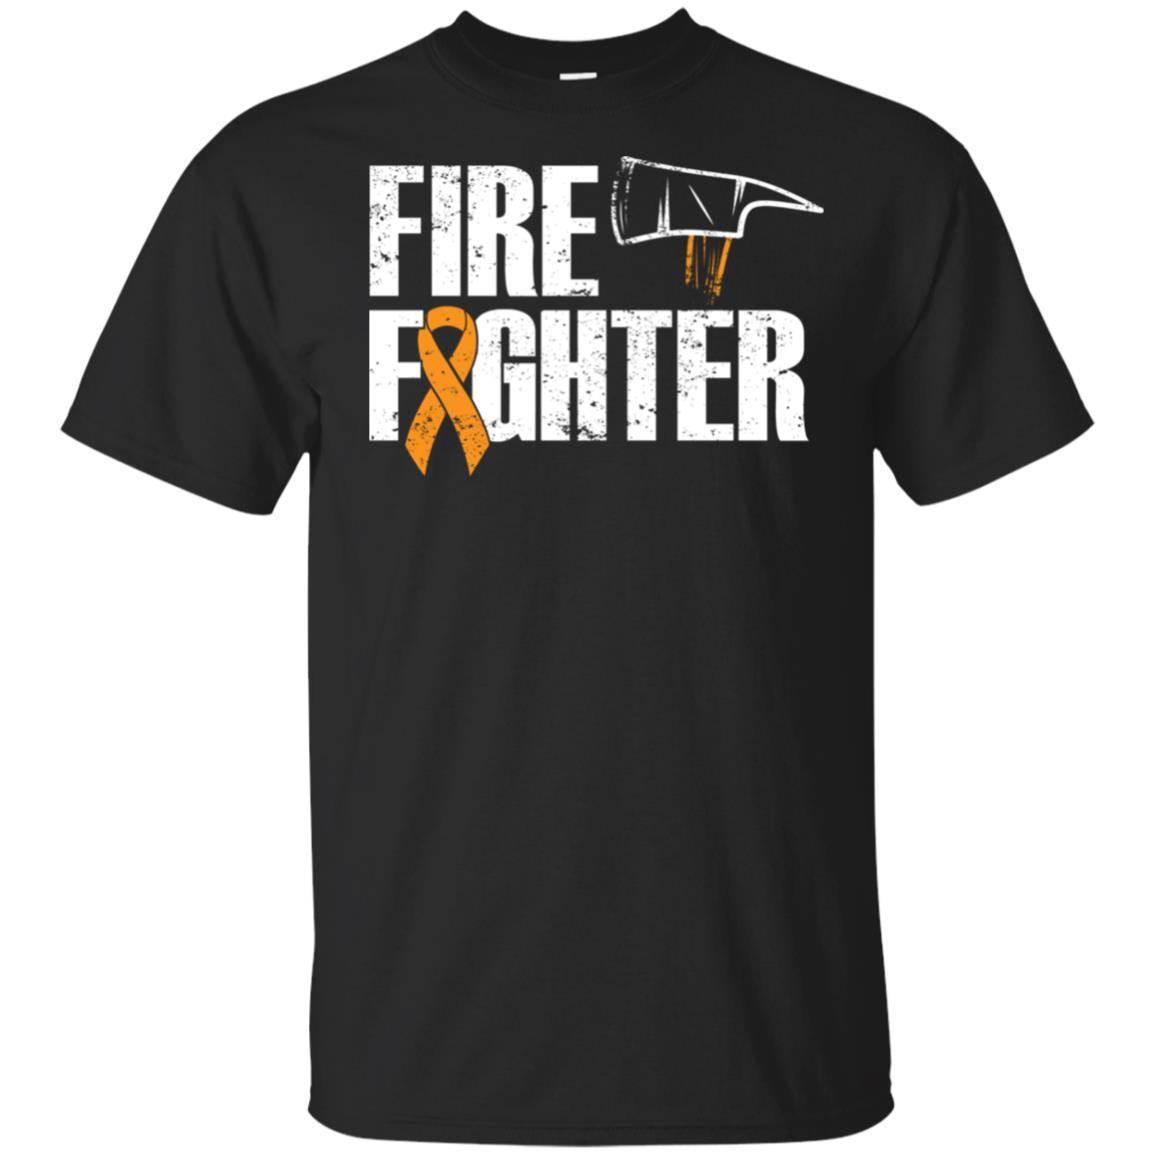 Firefighter Cancer – Leukemia Survivor Unisex Short Sleeve